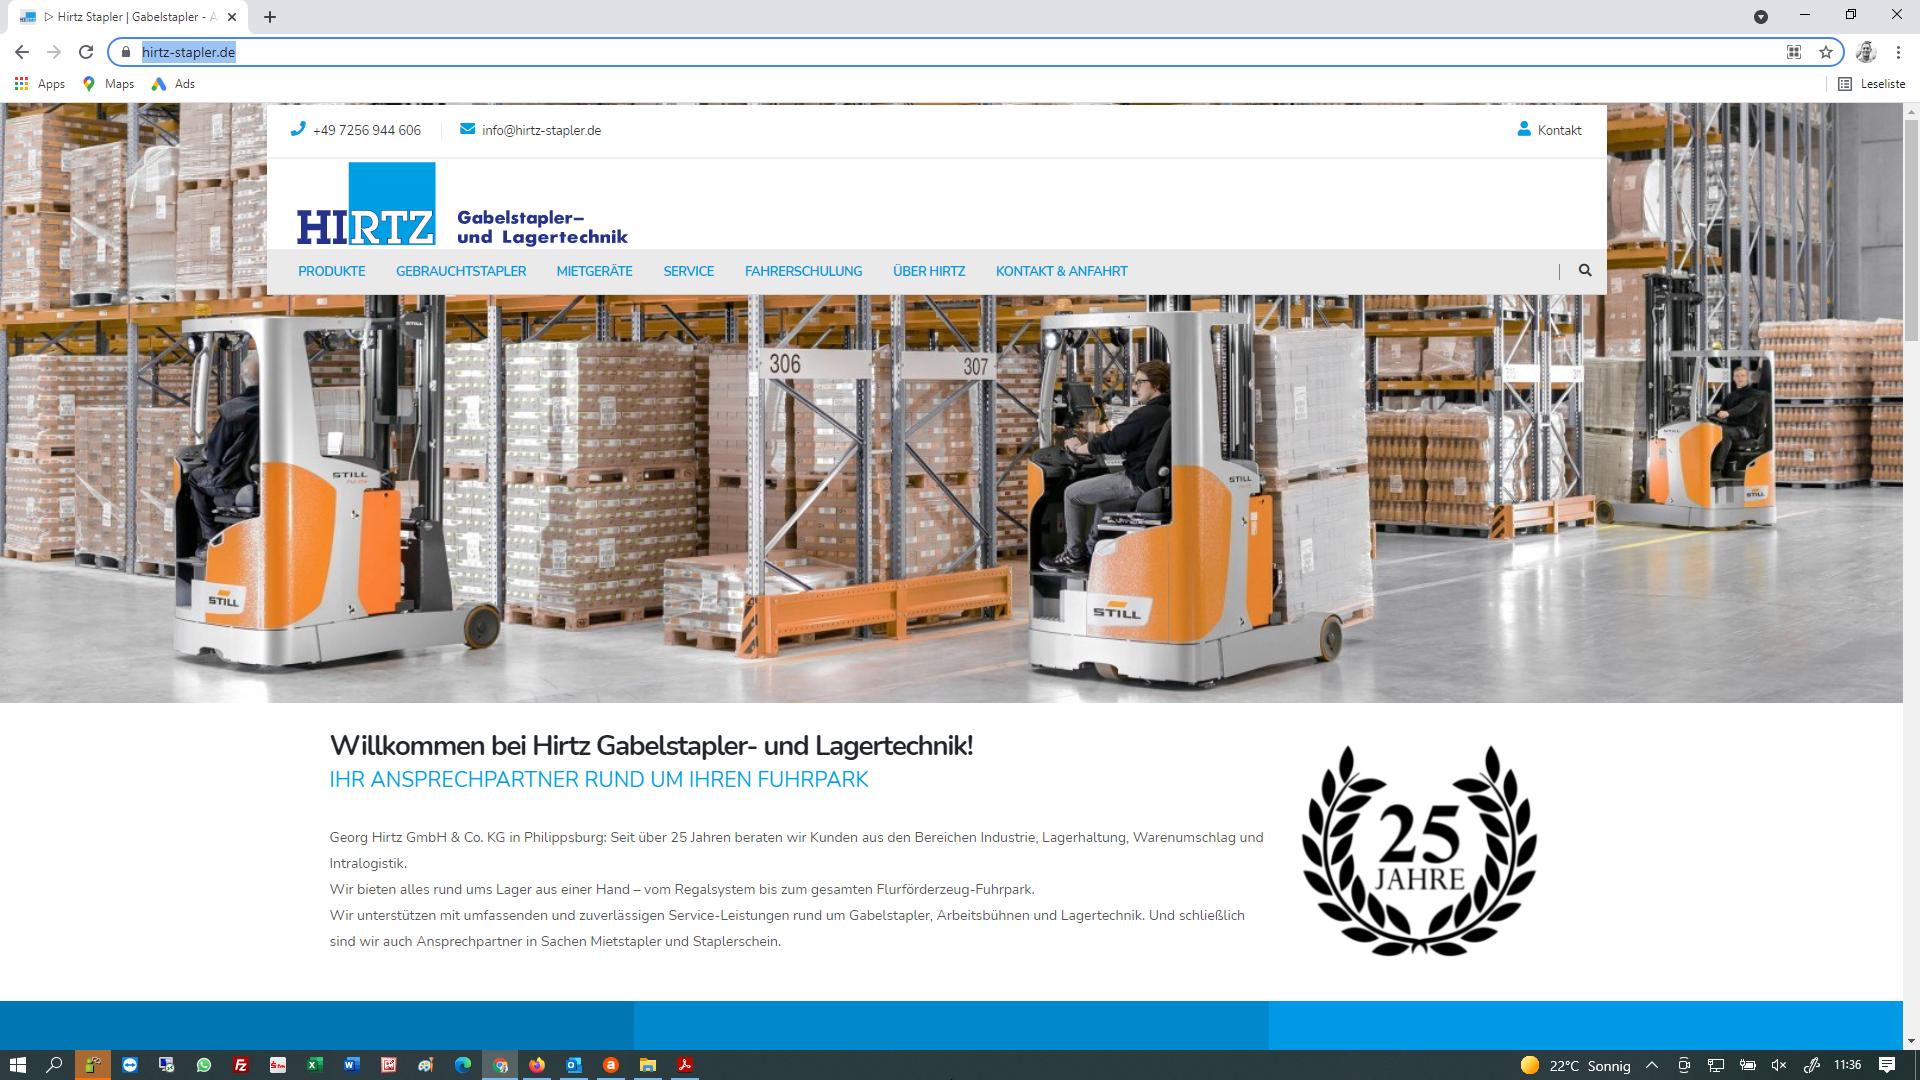 Georg Hirtz GmbH & Co KG